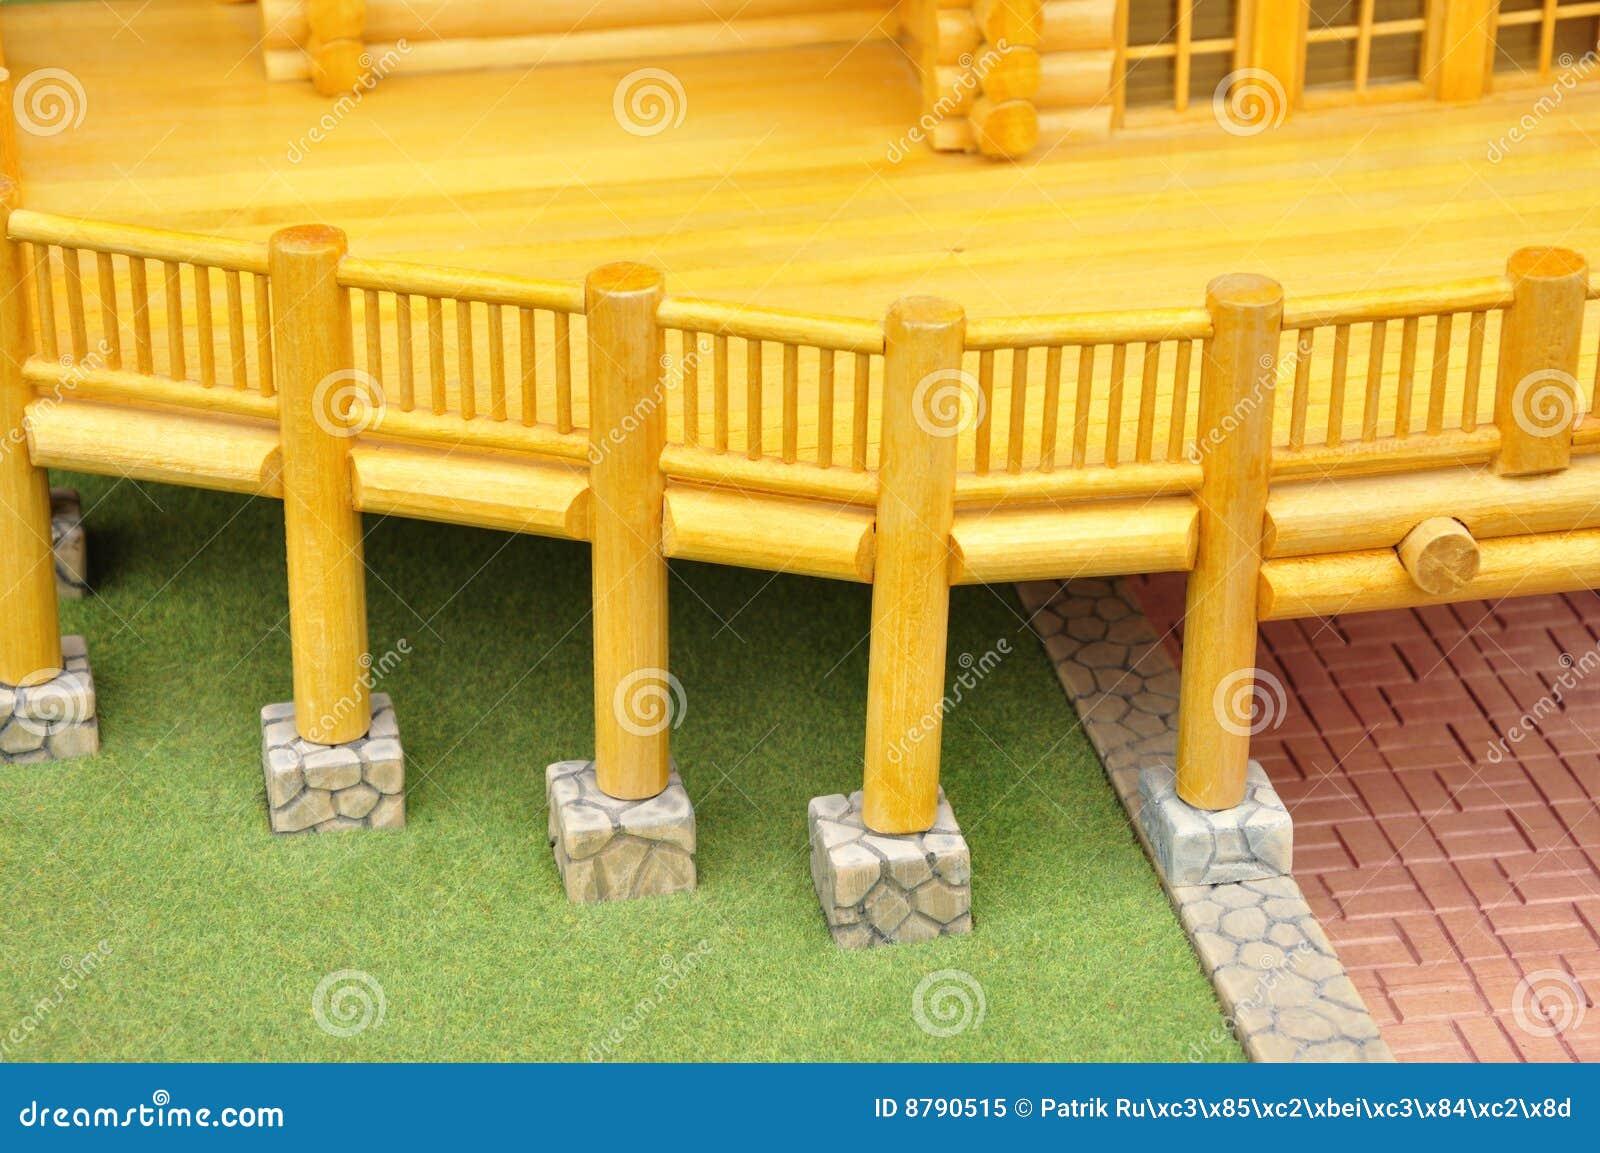 Mod le en bois de balcon photo libre de droits image 8790515 - Modele de balcon en bois ...